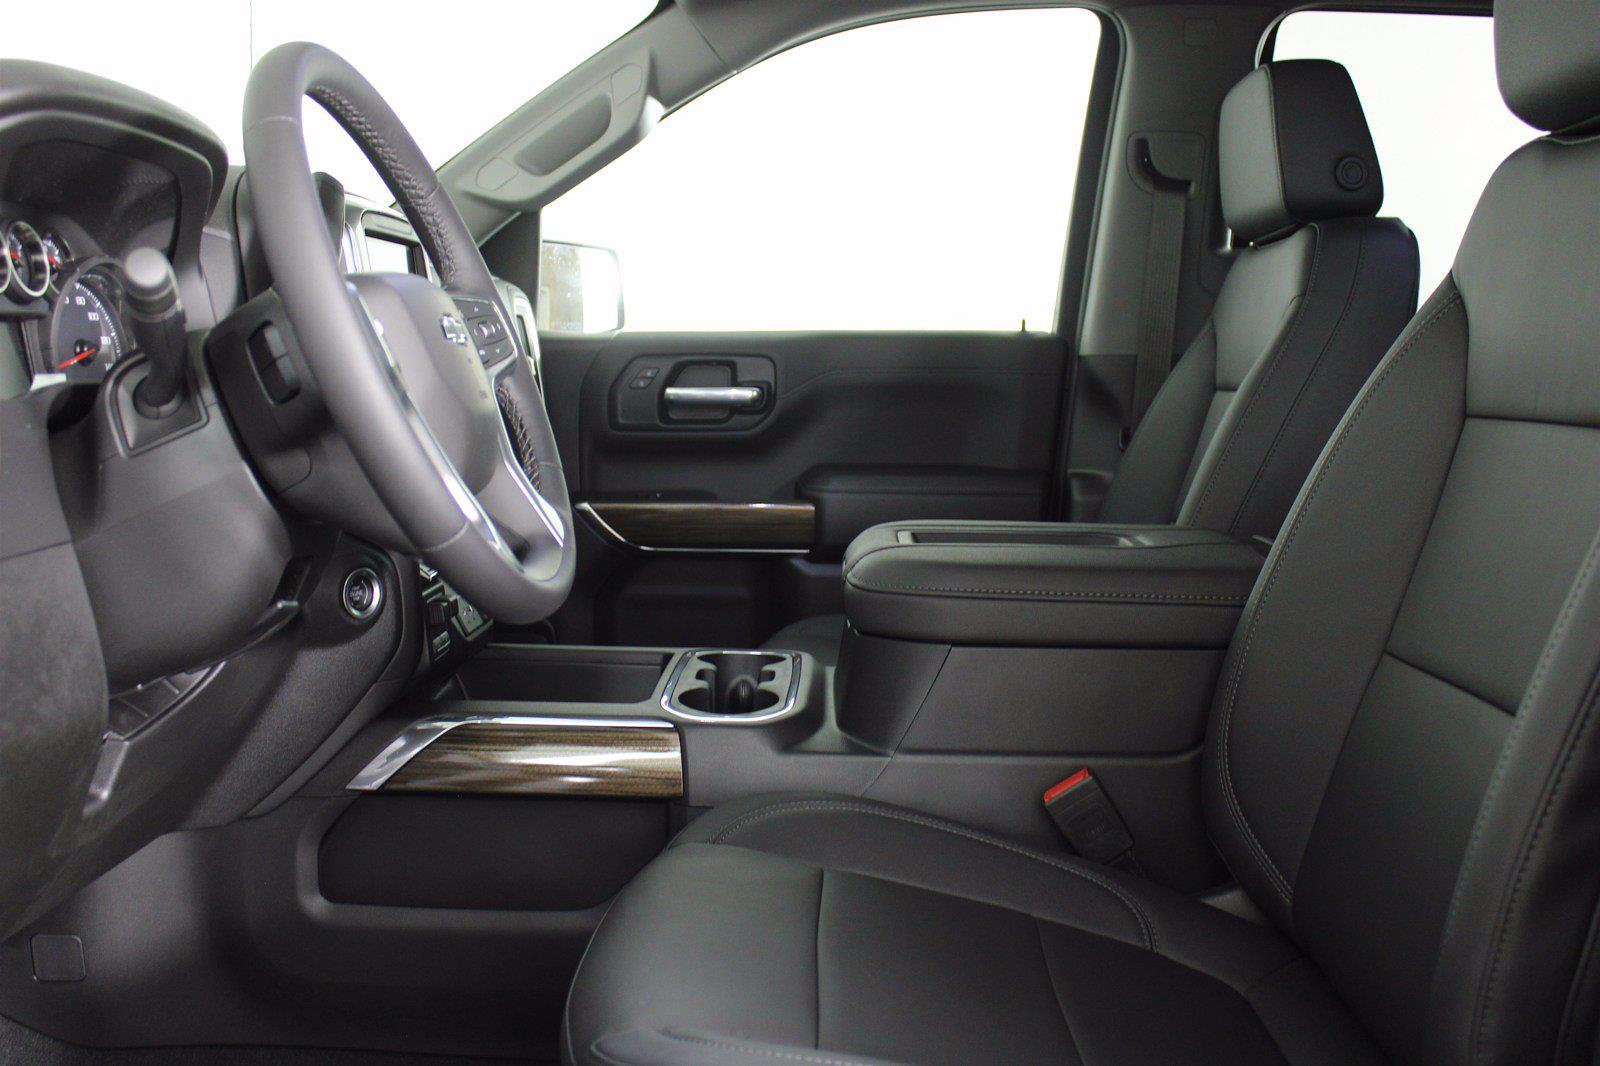 2021 Chevrolet Silverado 1500 Crew Cab 4x4, Pickup #D111073 - photo 15